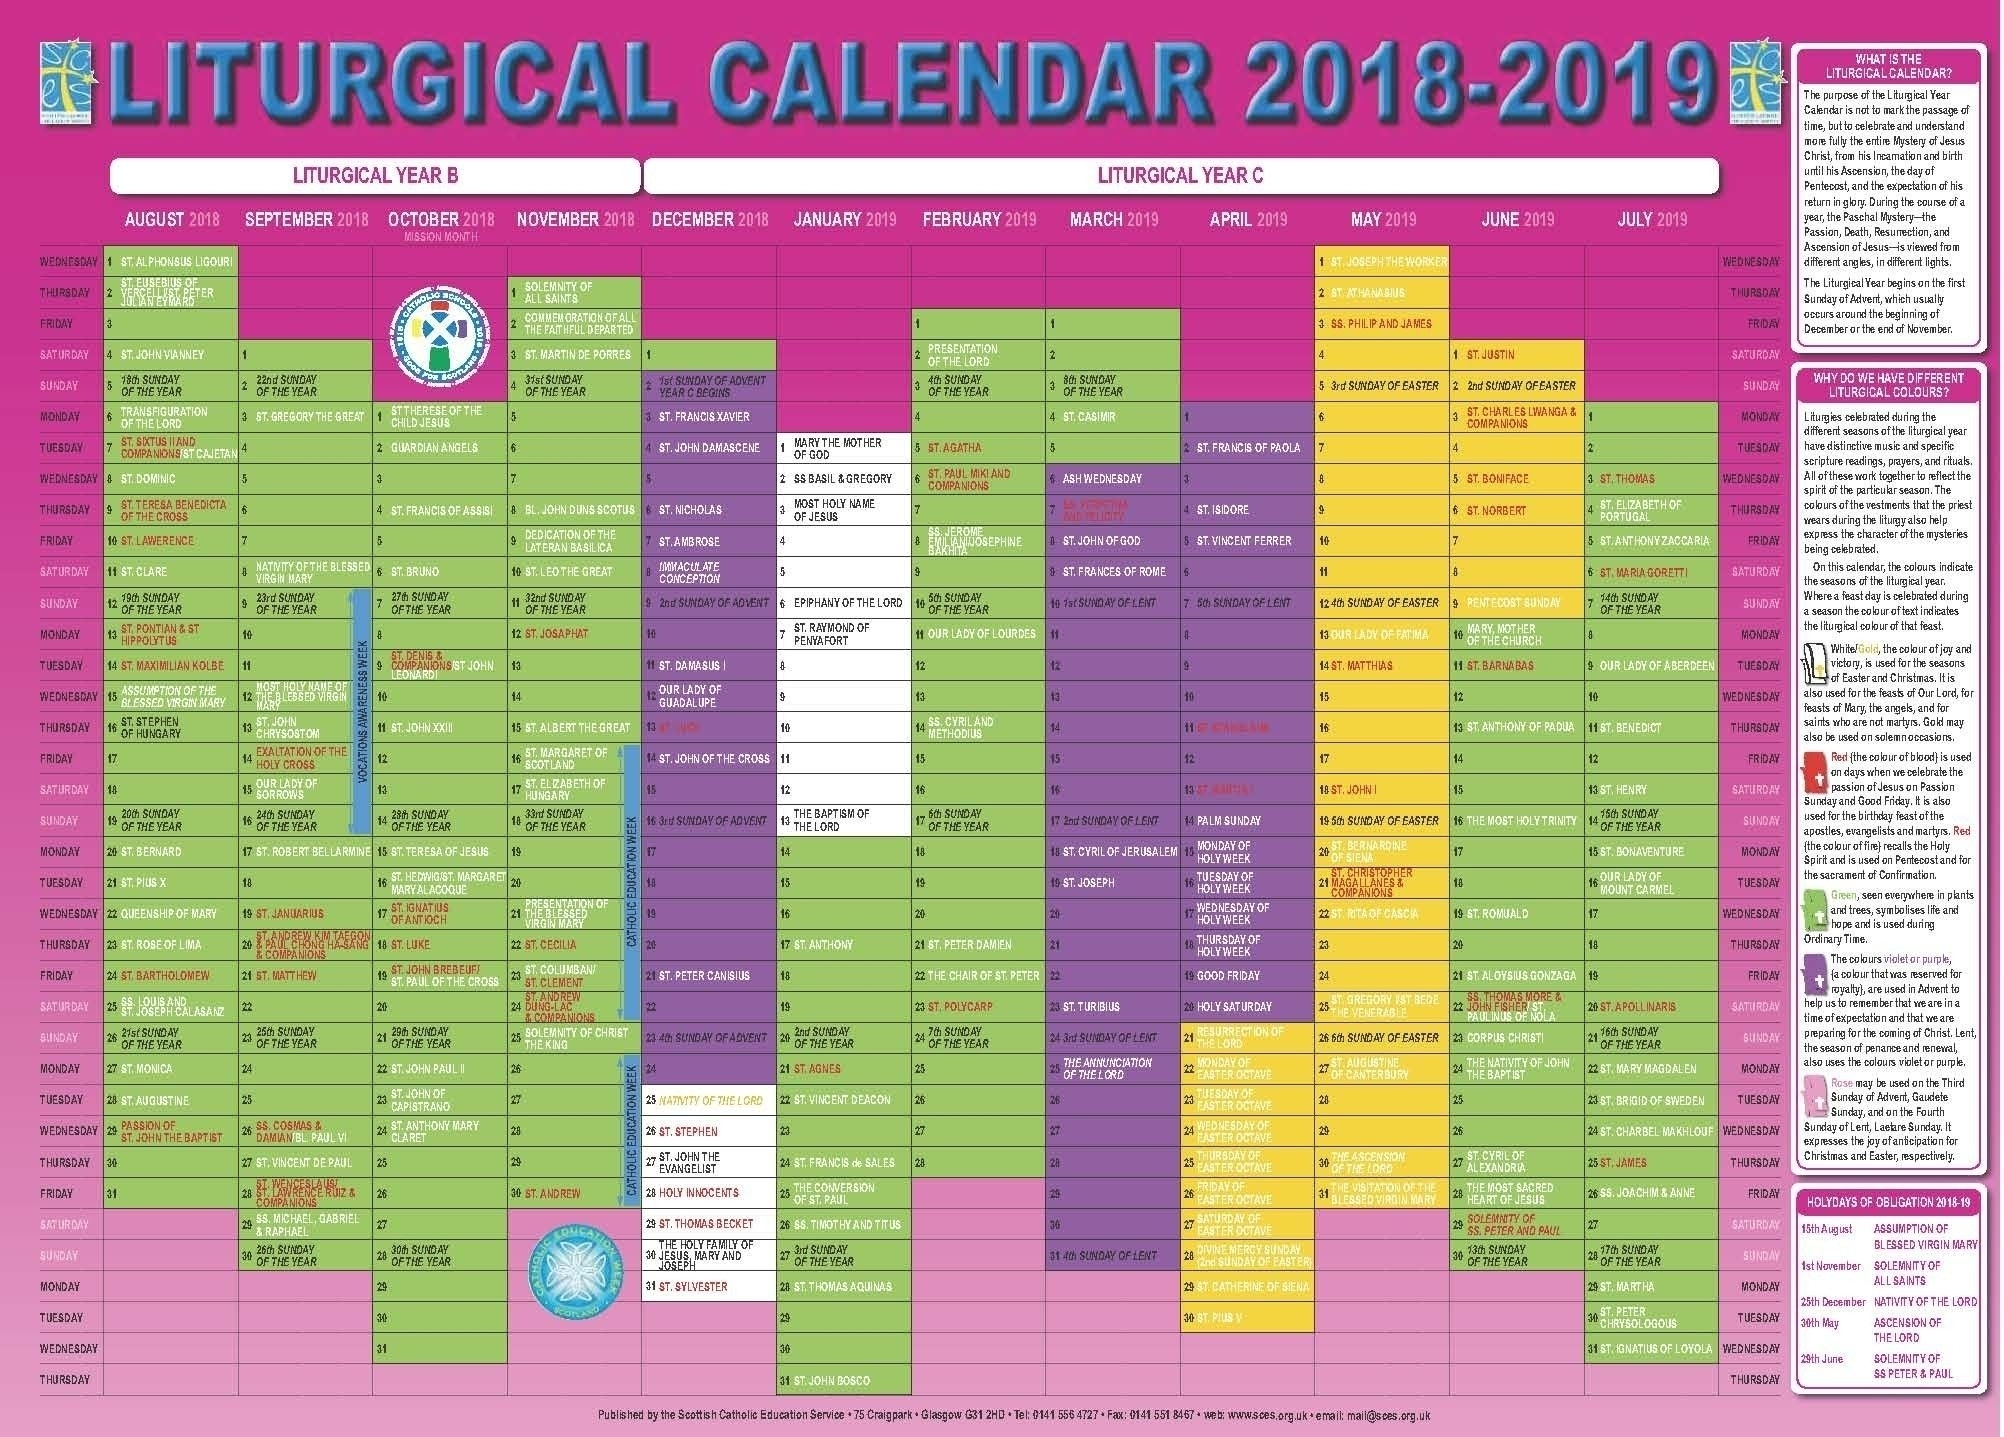 Free Printable Liturgical Calendar In 2020 | Catholic with regard to Catholic Liturgical Calendar Free Printable 2020